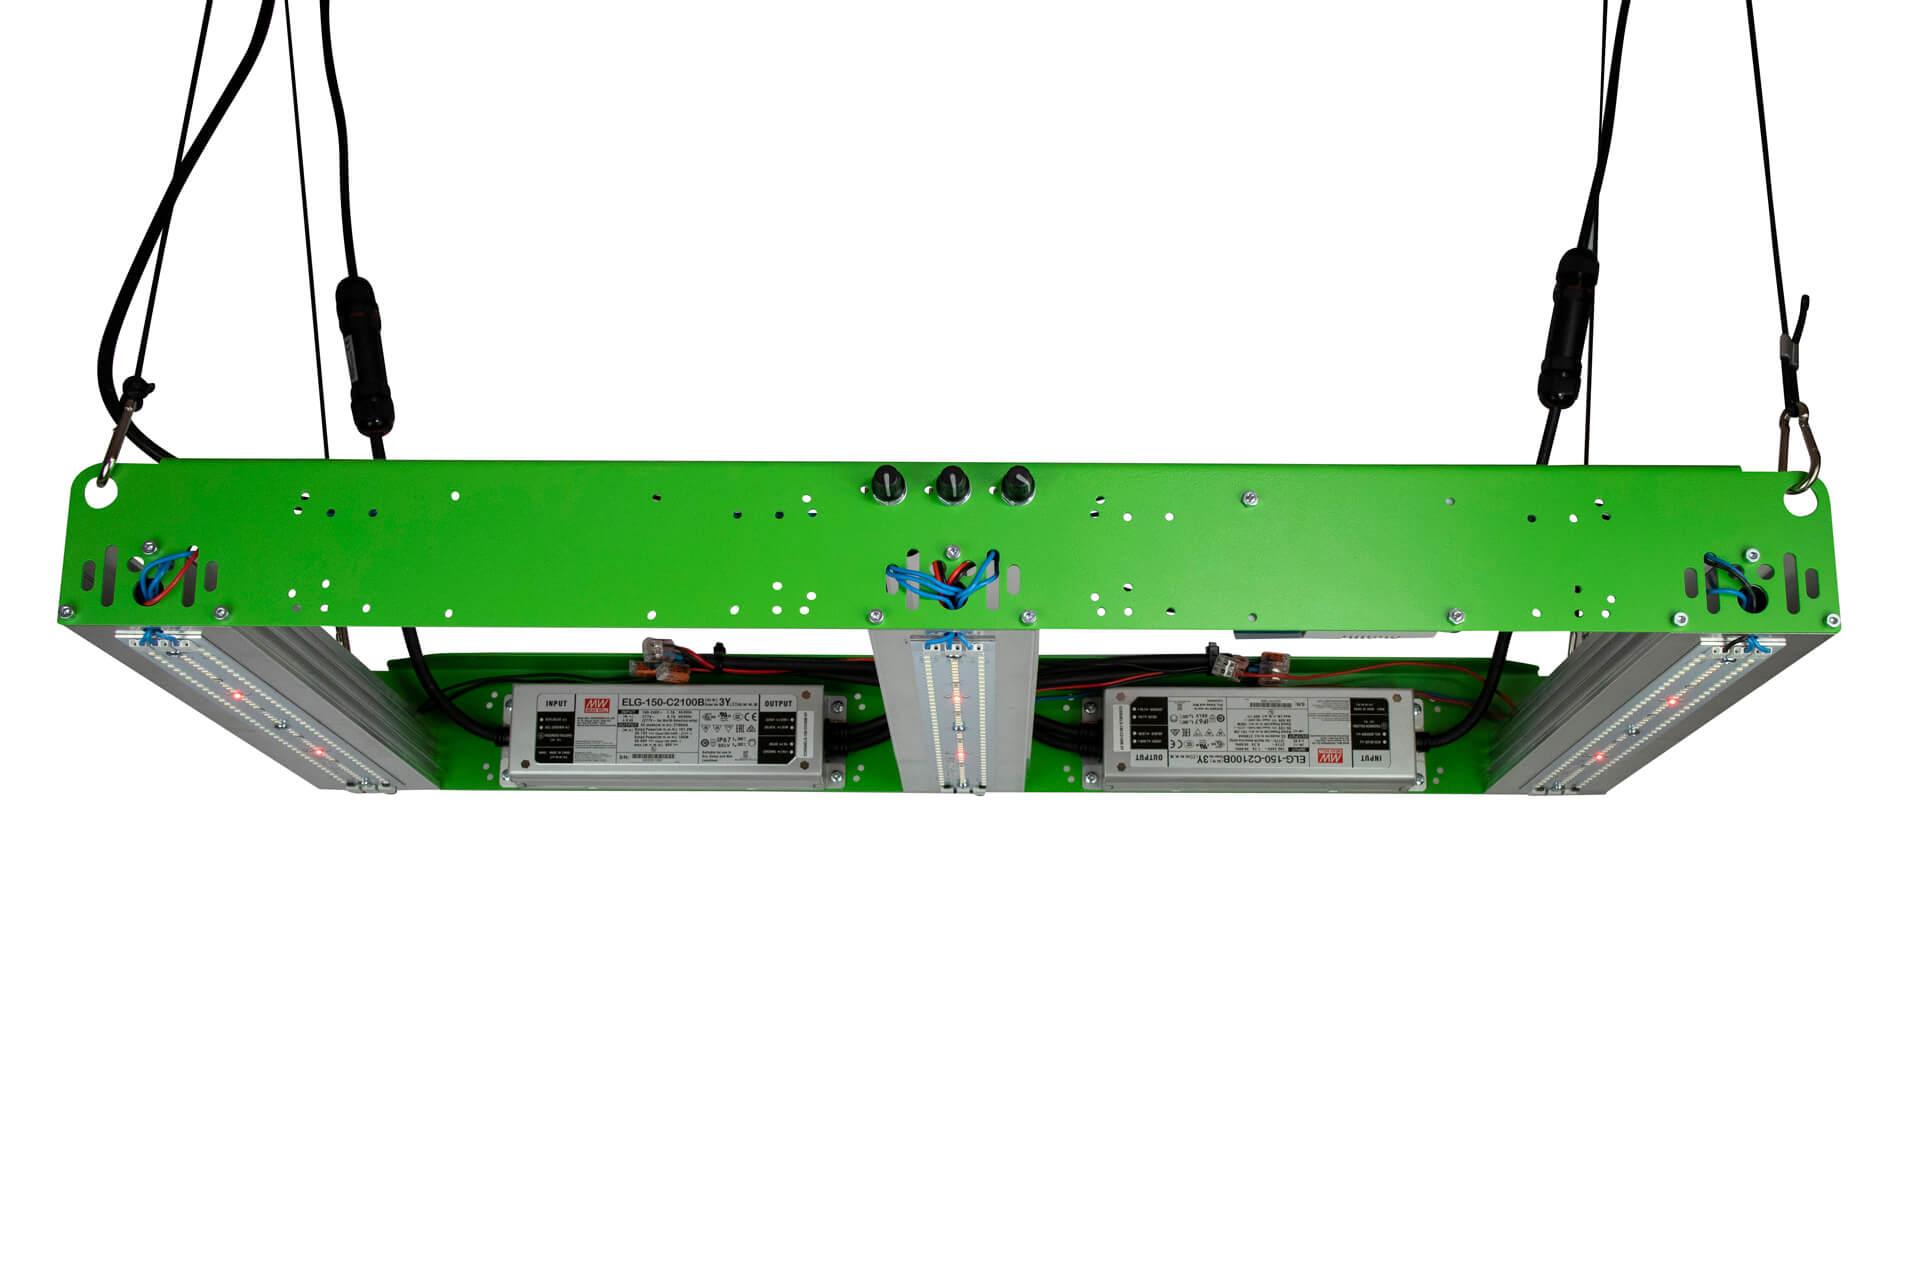 DIY-M-KIT-2-Series-short-225w-farred-channel-on-pro-emit